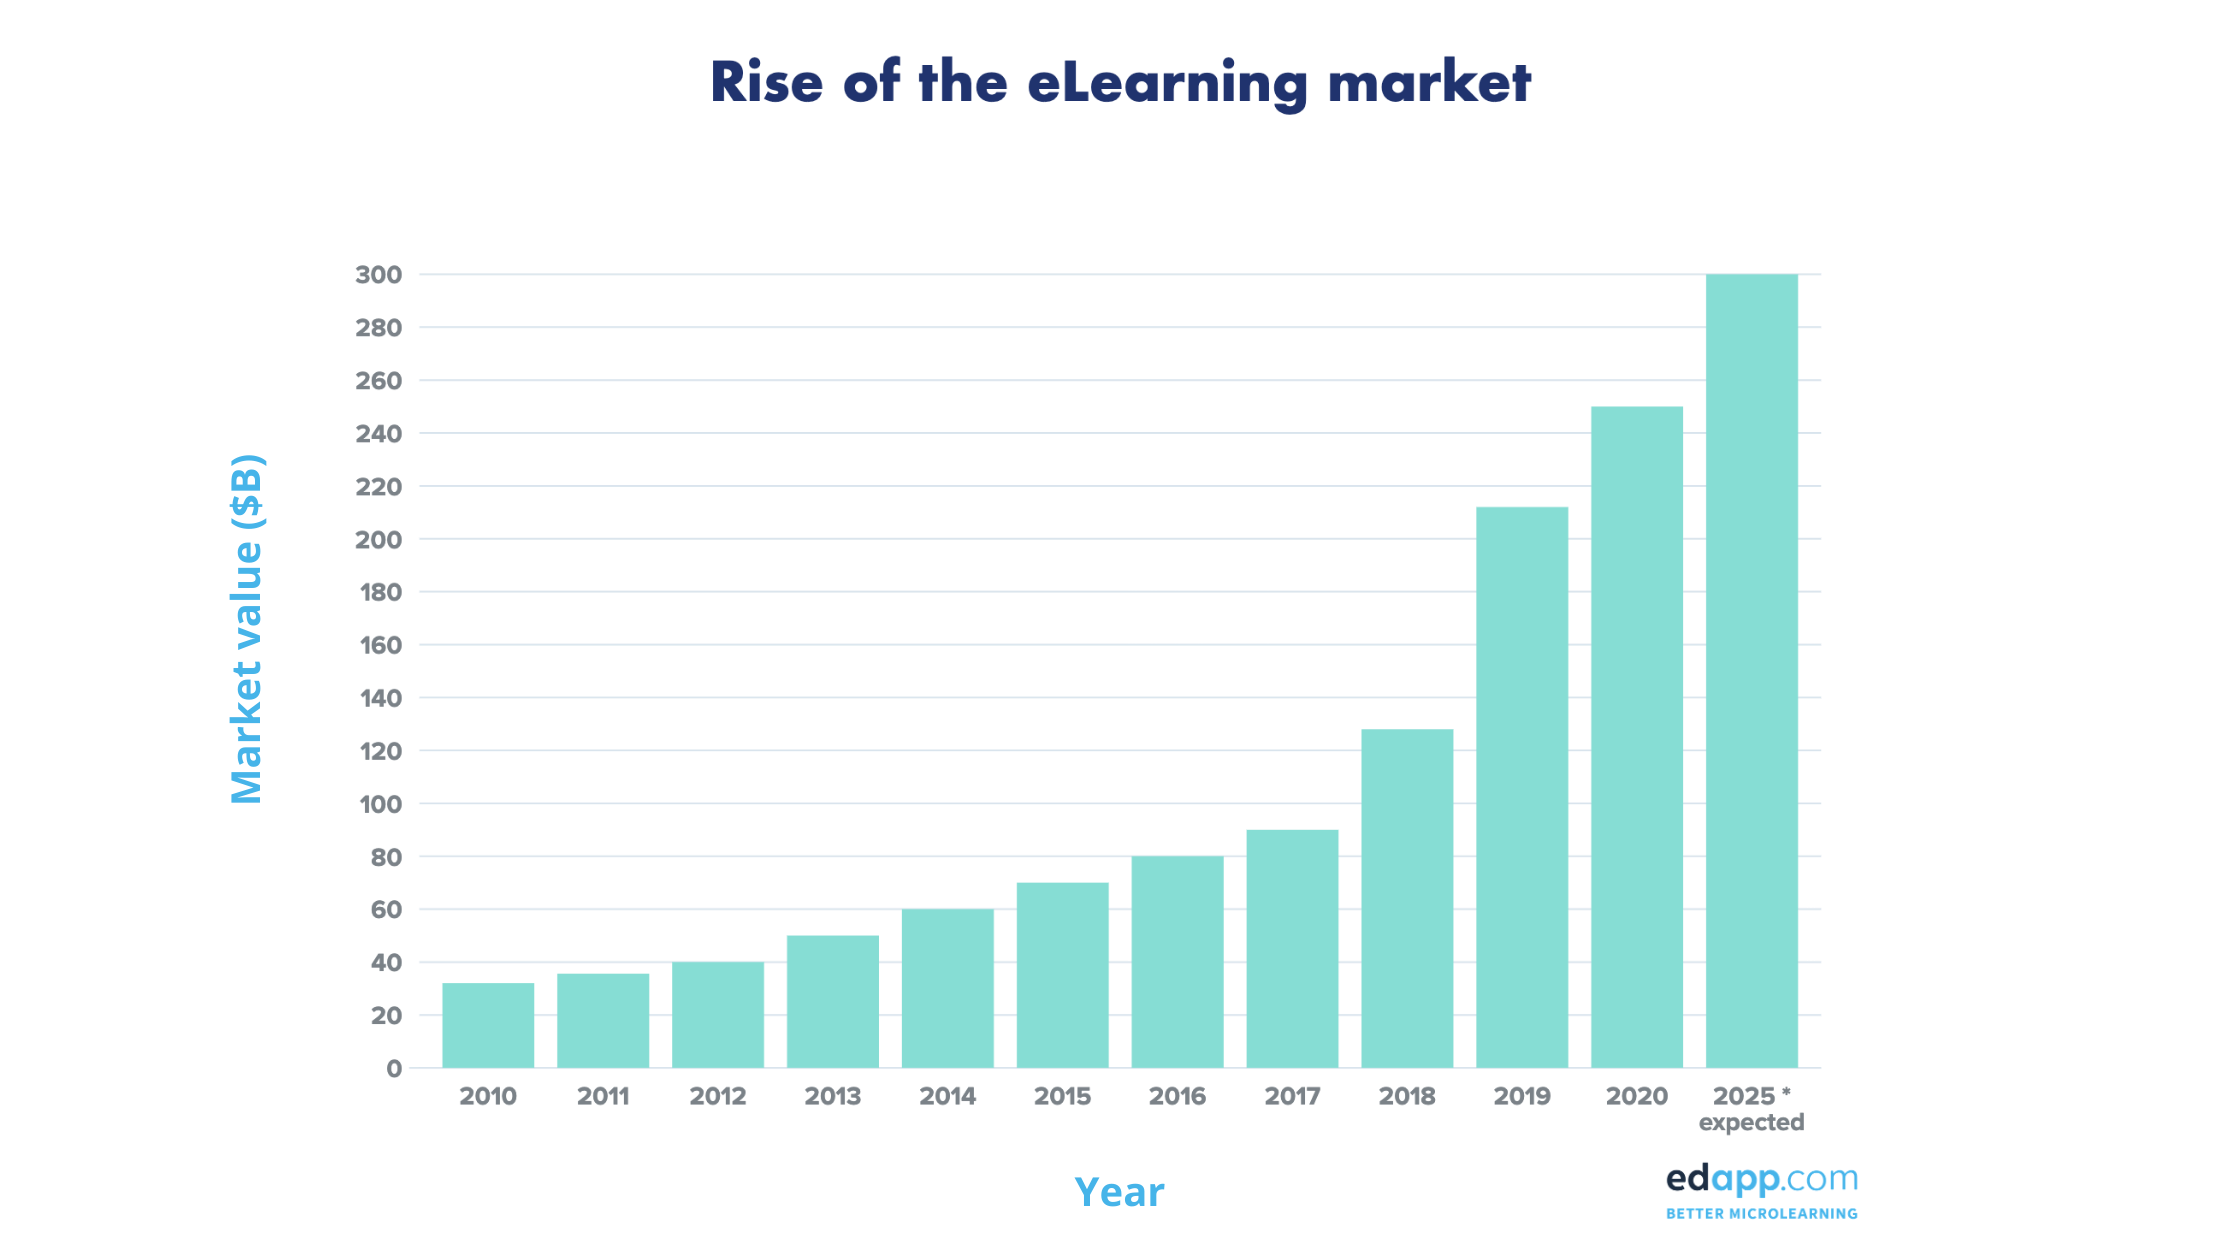 Elearning Statistics 2020 - Elearning Market Value